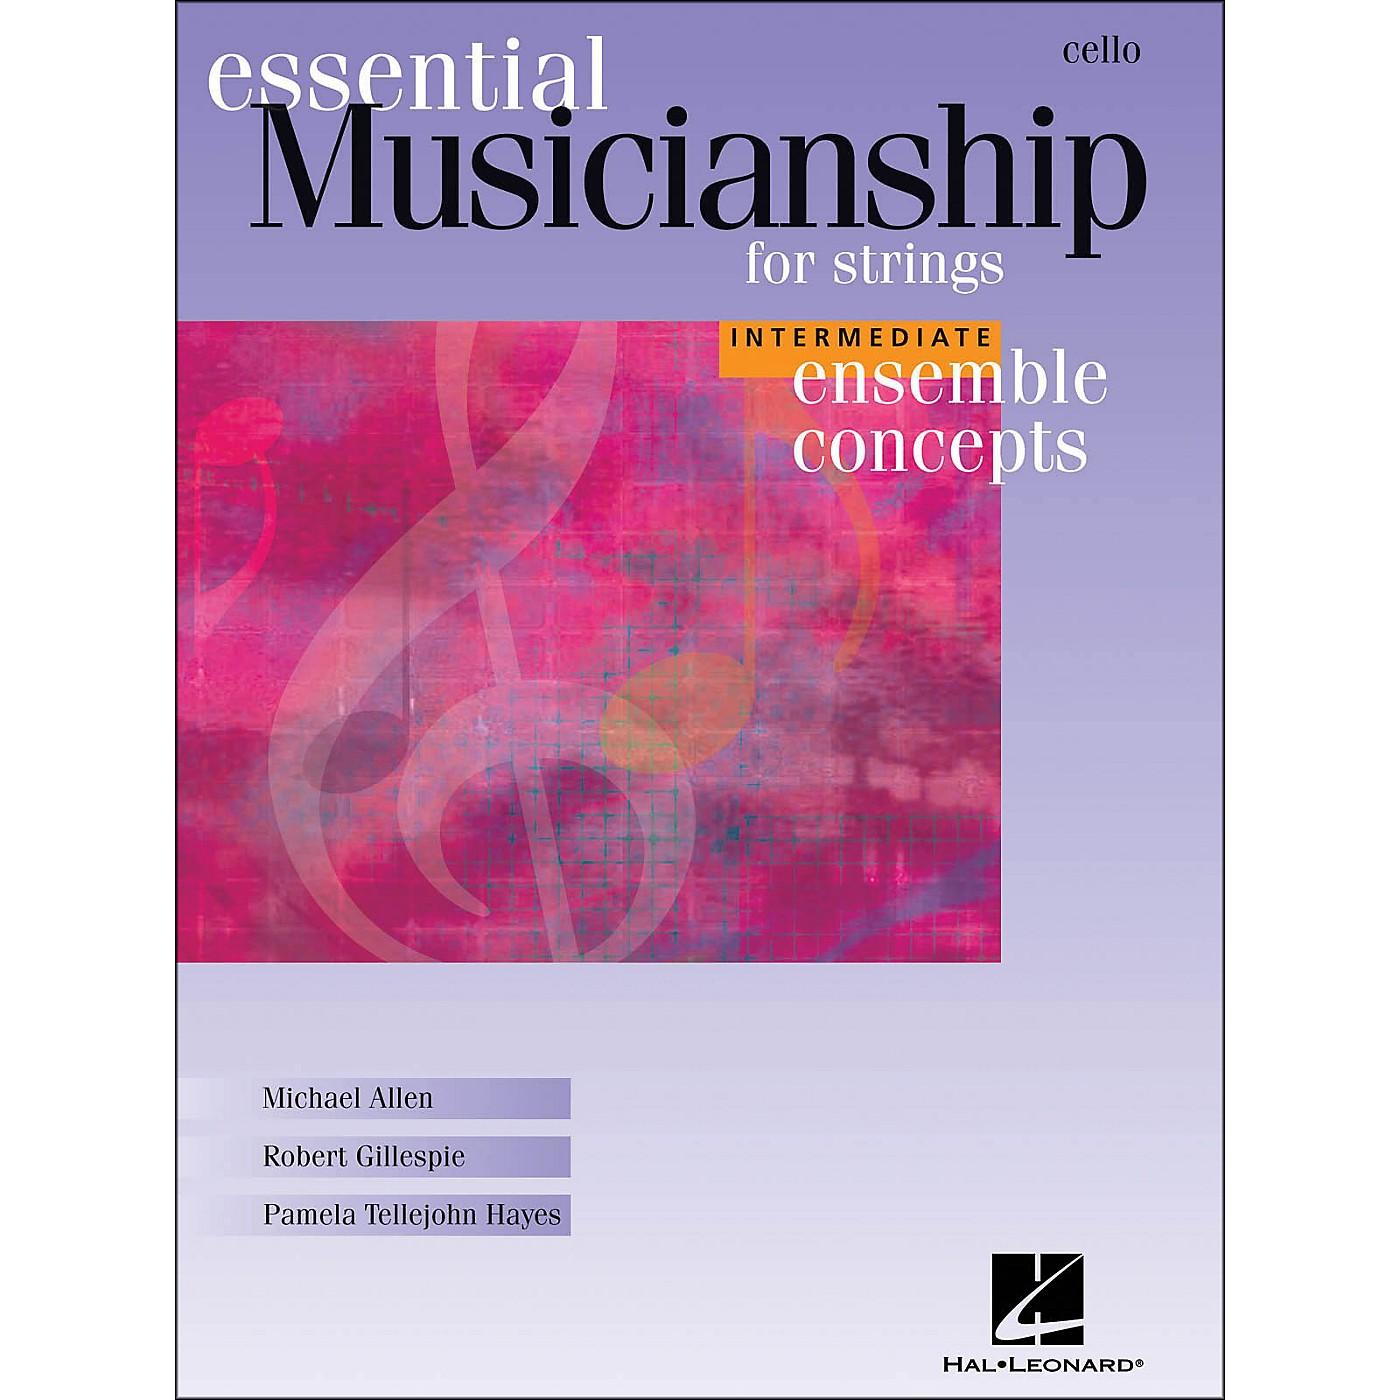 Hal Leonard Essential Musicianship for Strings - Ensemble Concepts Intermediate Cello thumbnail